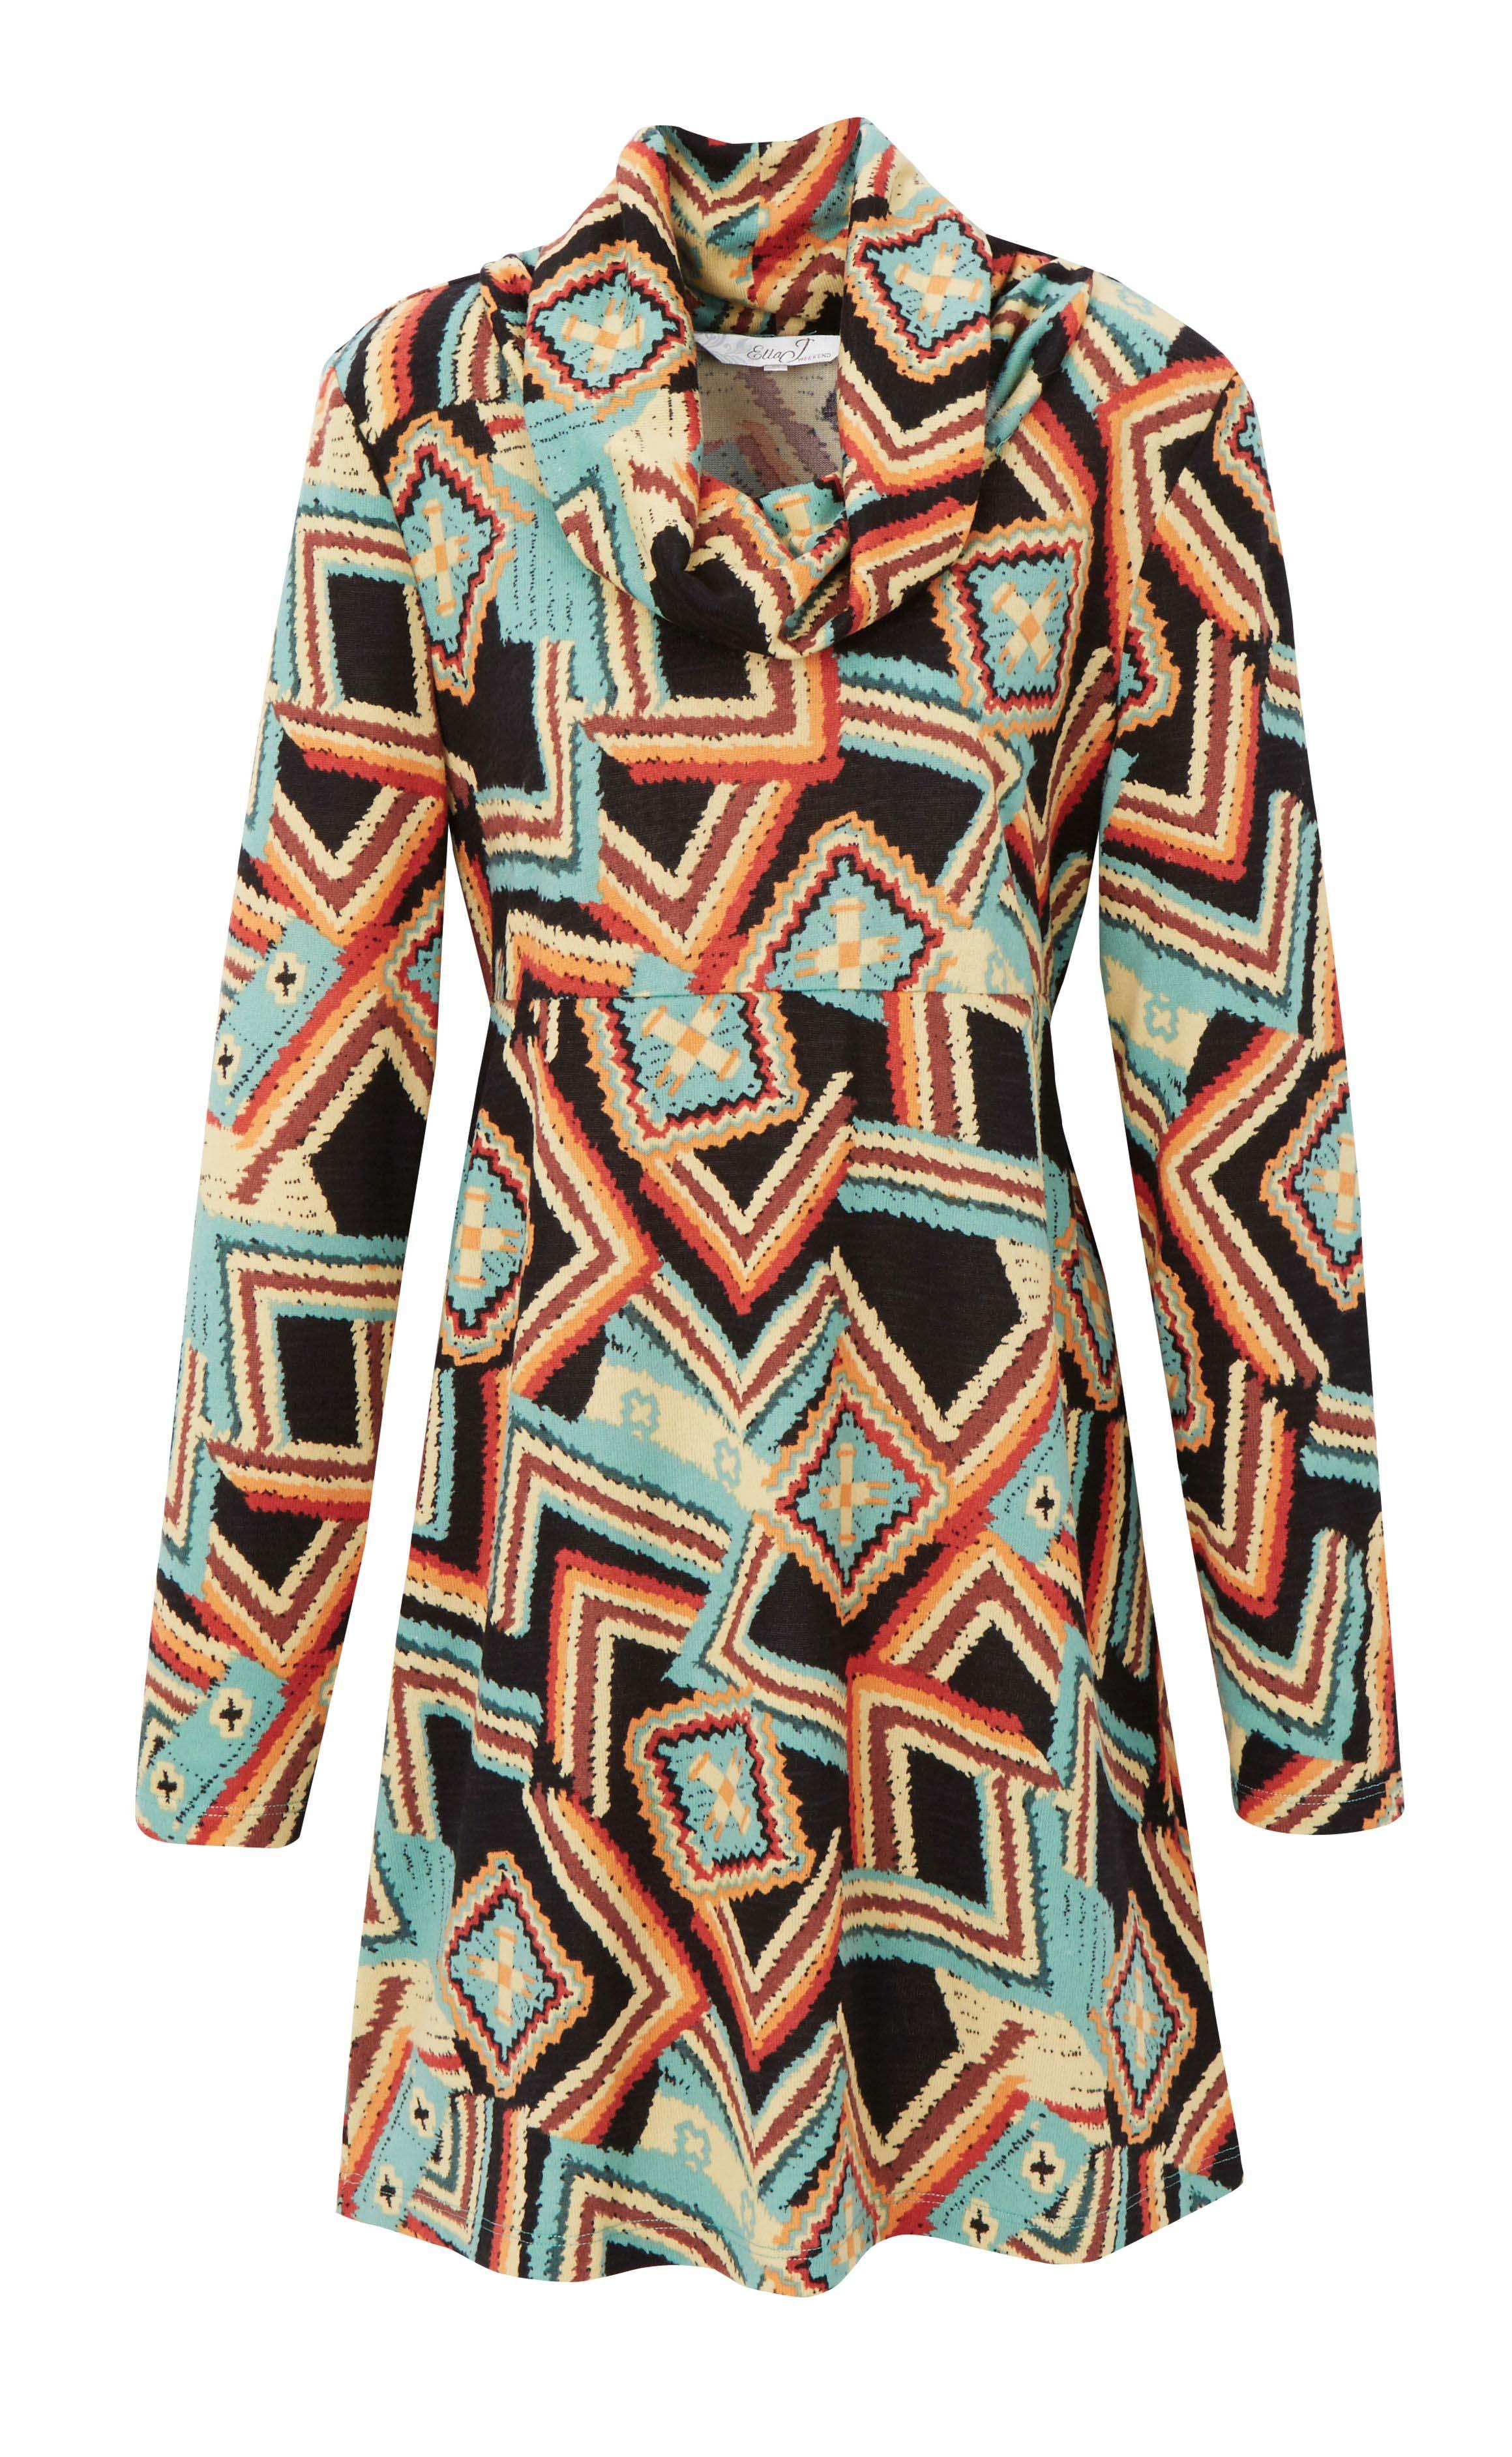 6085443 Ella J Weekend Cowl Neck Winter Knit Longline Top Aztec Print $59.99 Instore 8 Mar 2016